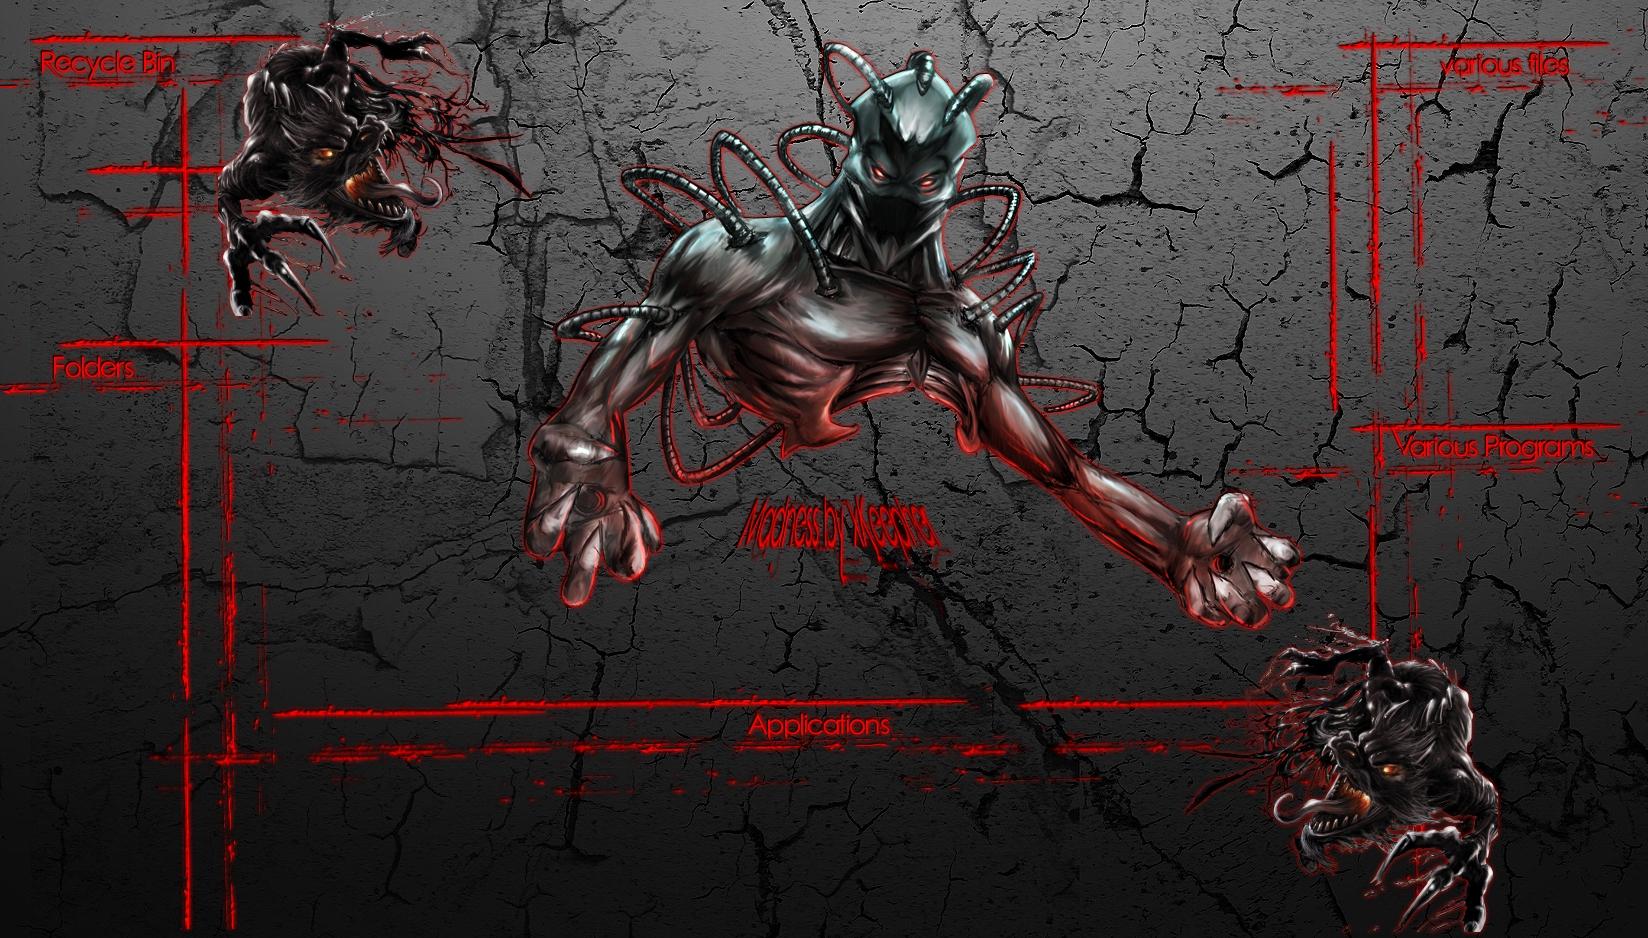 Madness - HD Wallpaper Madness_wallpaper_hd_by_xkeepher-d5jshon